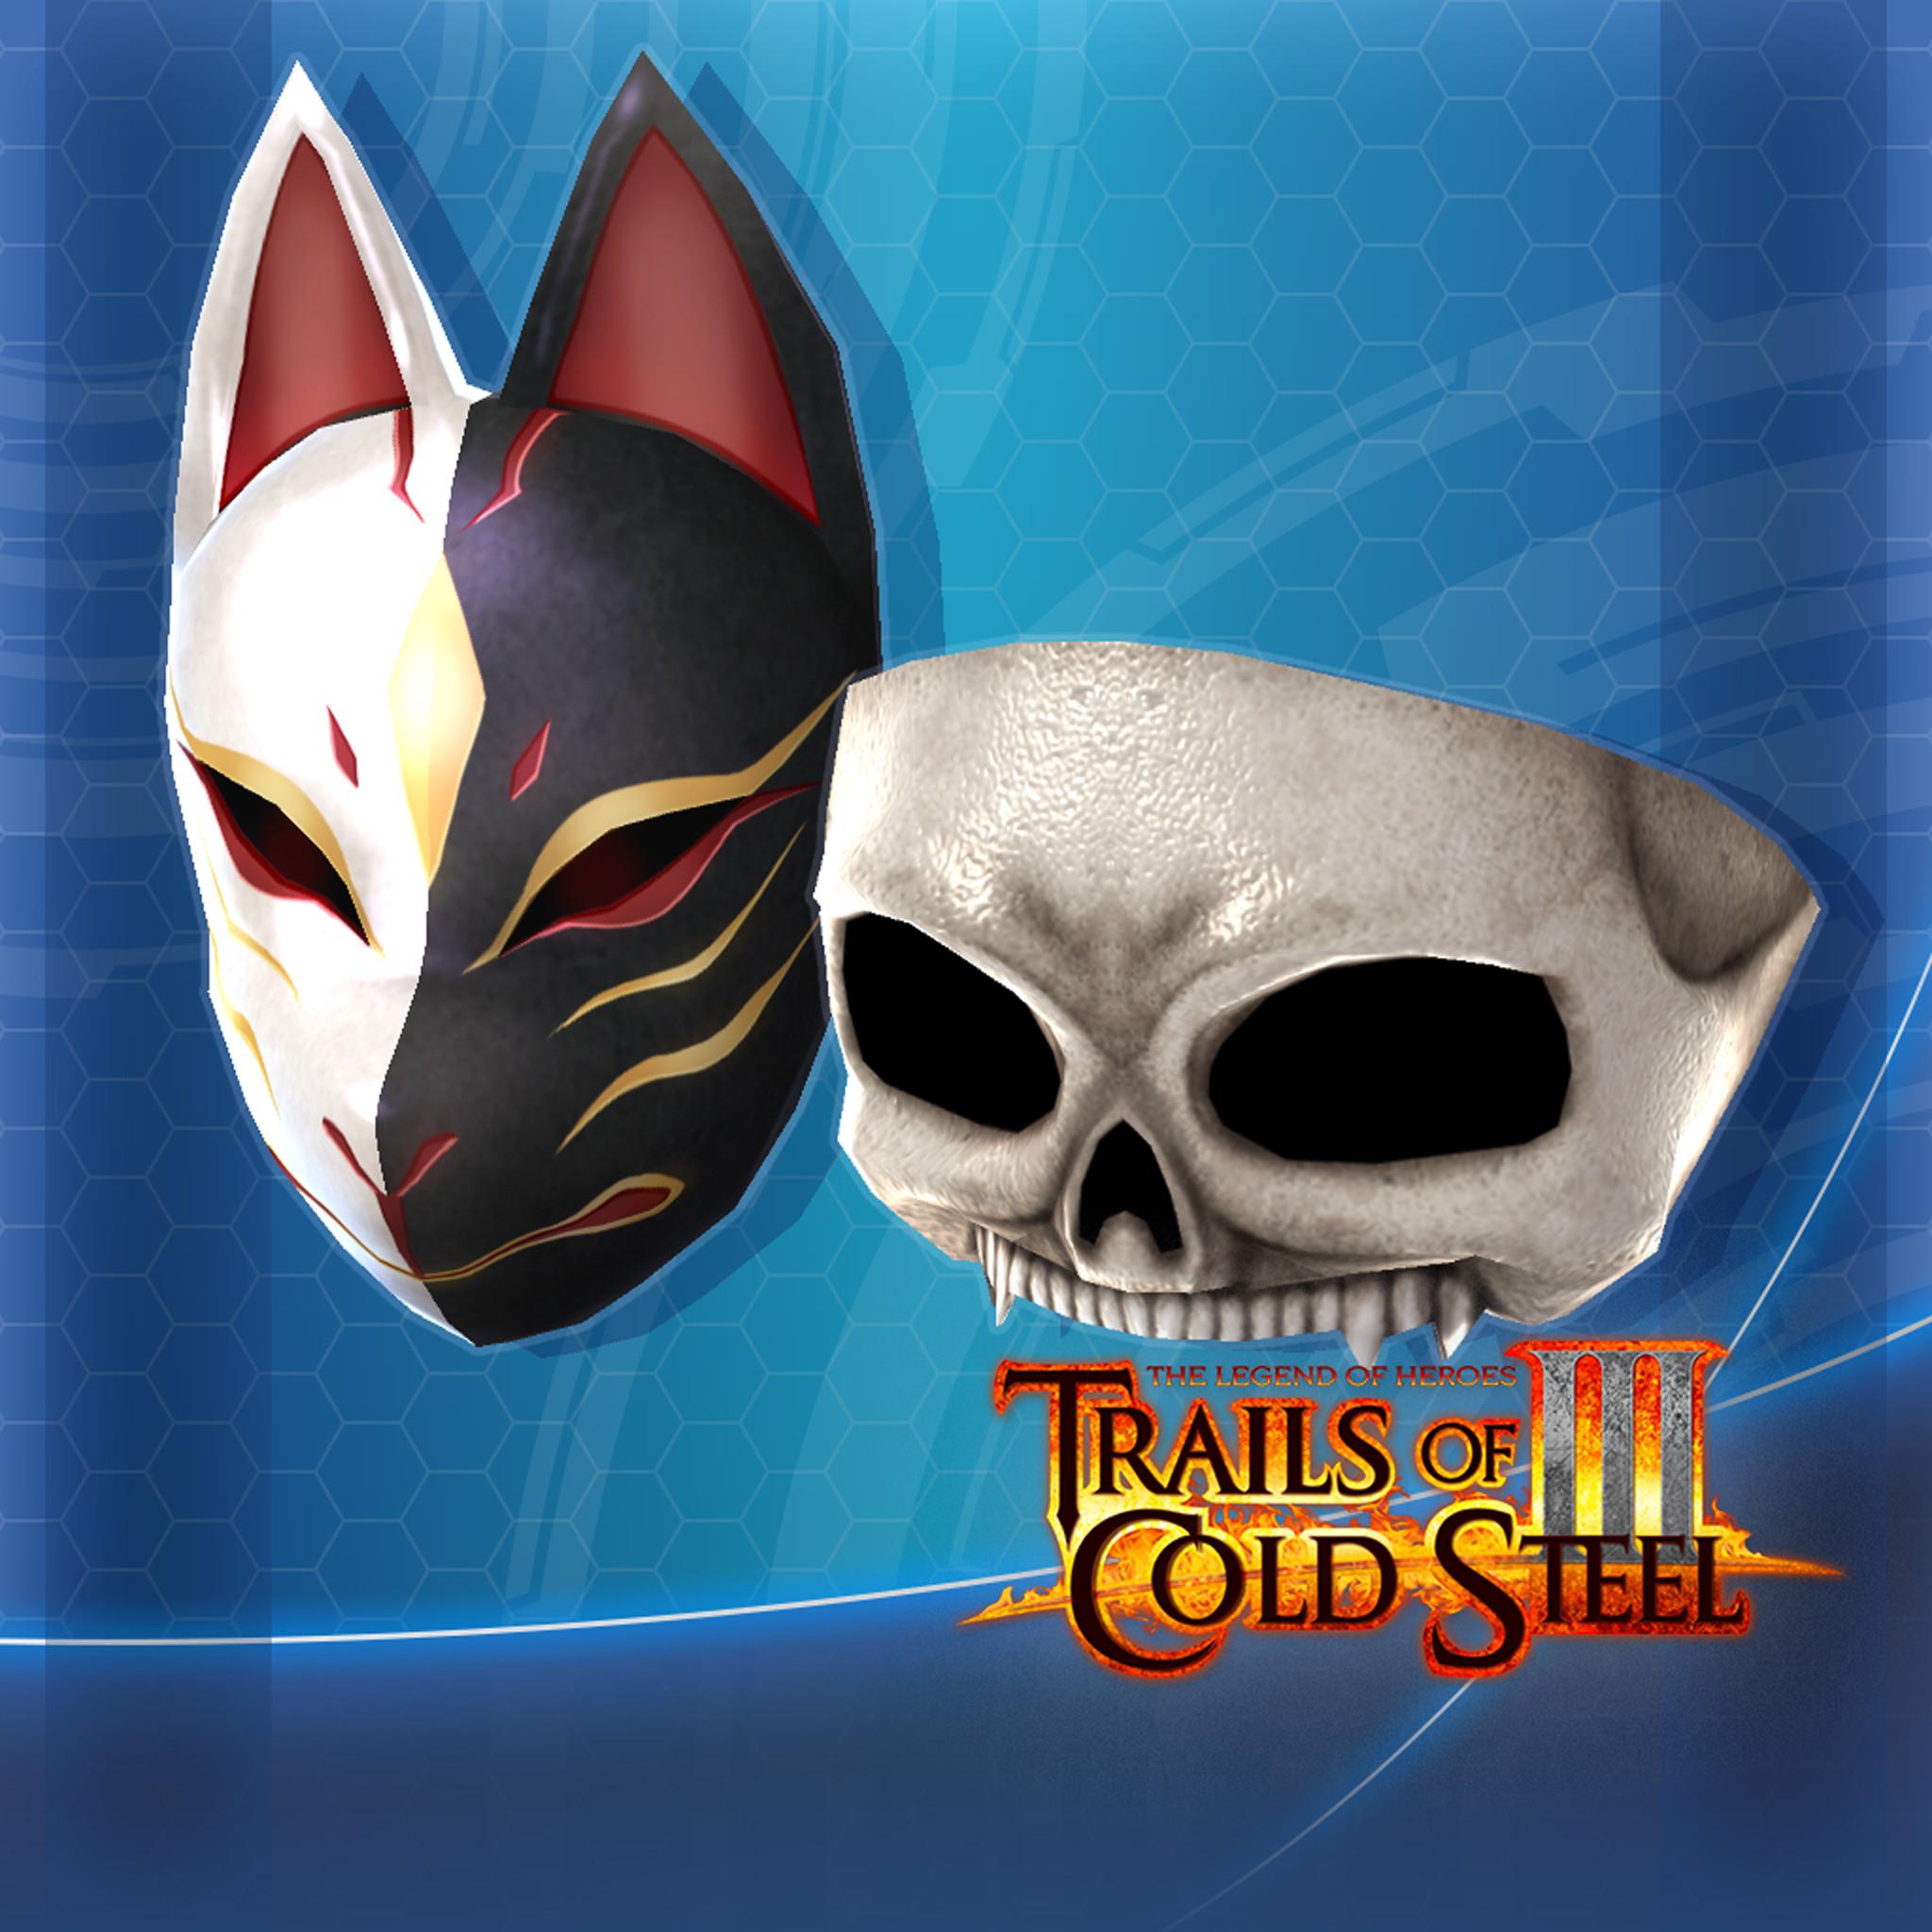 The Legend of Heroes: Trails of Cold Steel III  - Mask Set screenshot